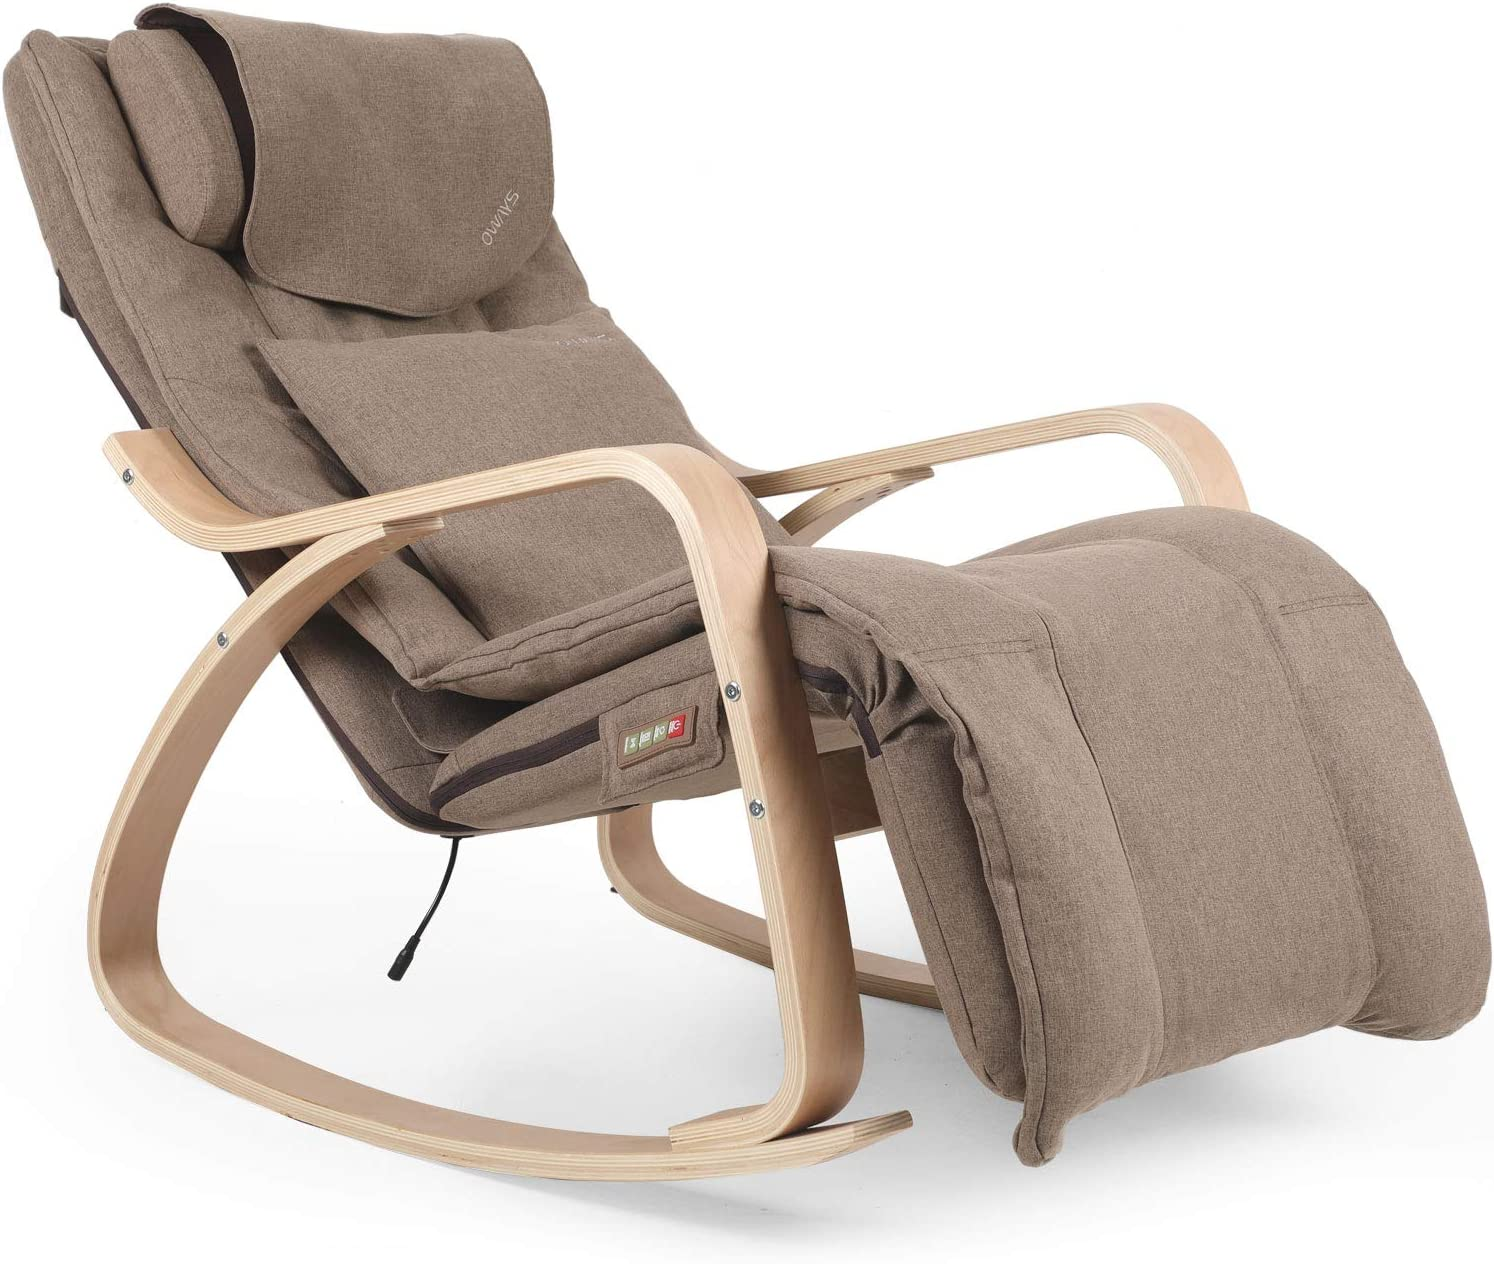 OWAYS Massage Chair, Rocking Massage Chair and Recliner,